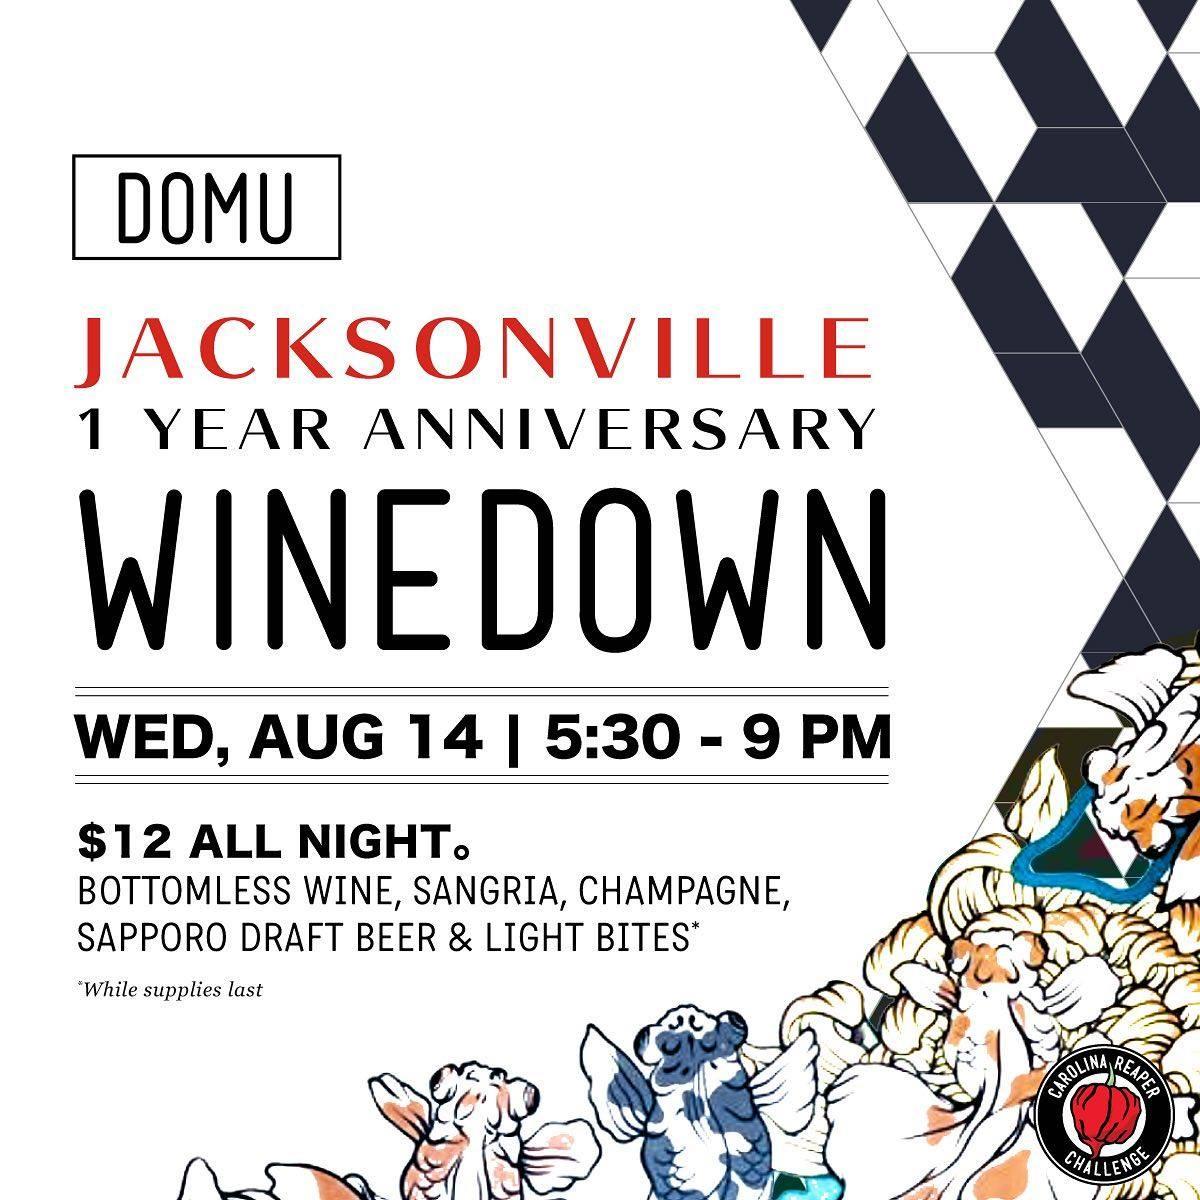 WineDown at DOMU